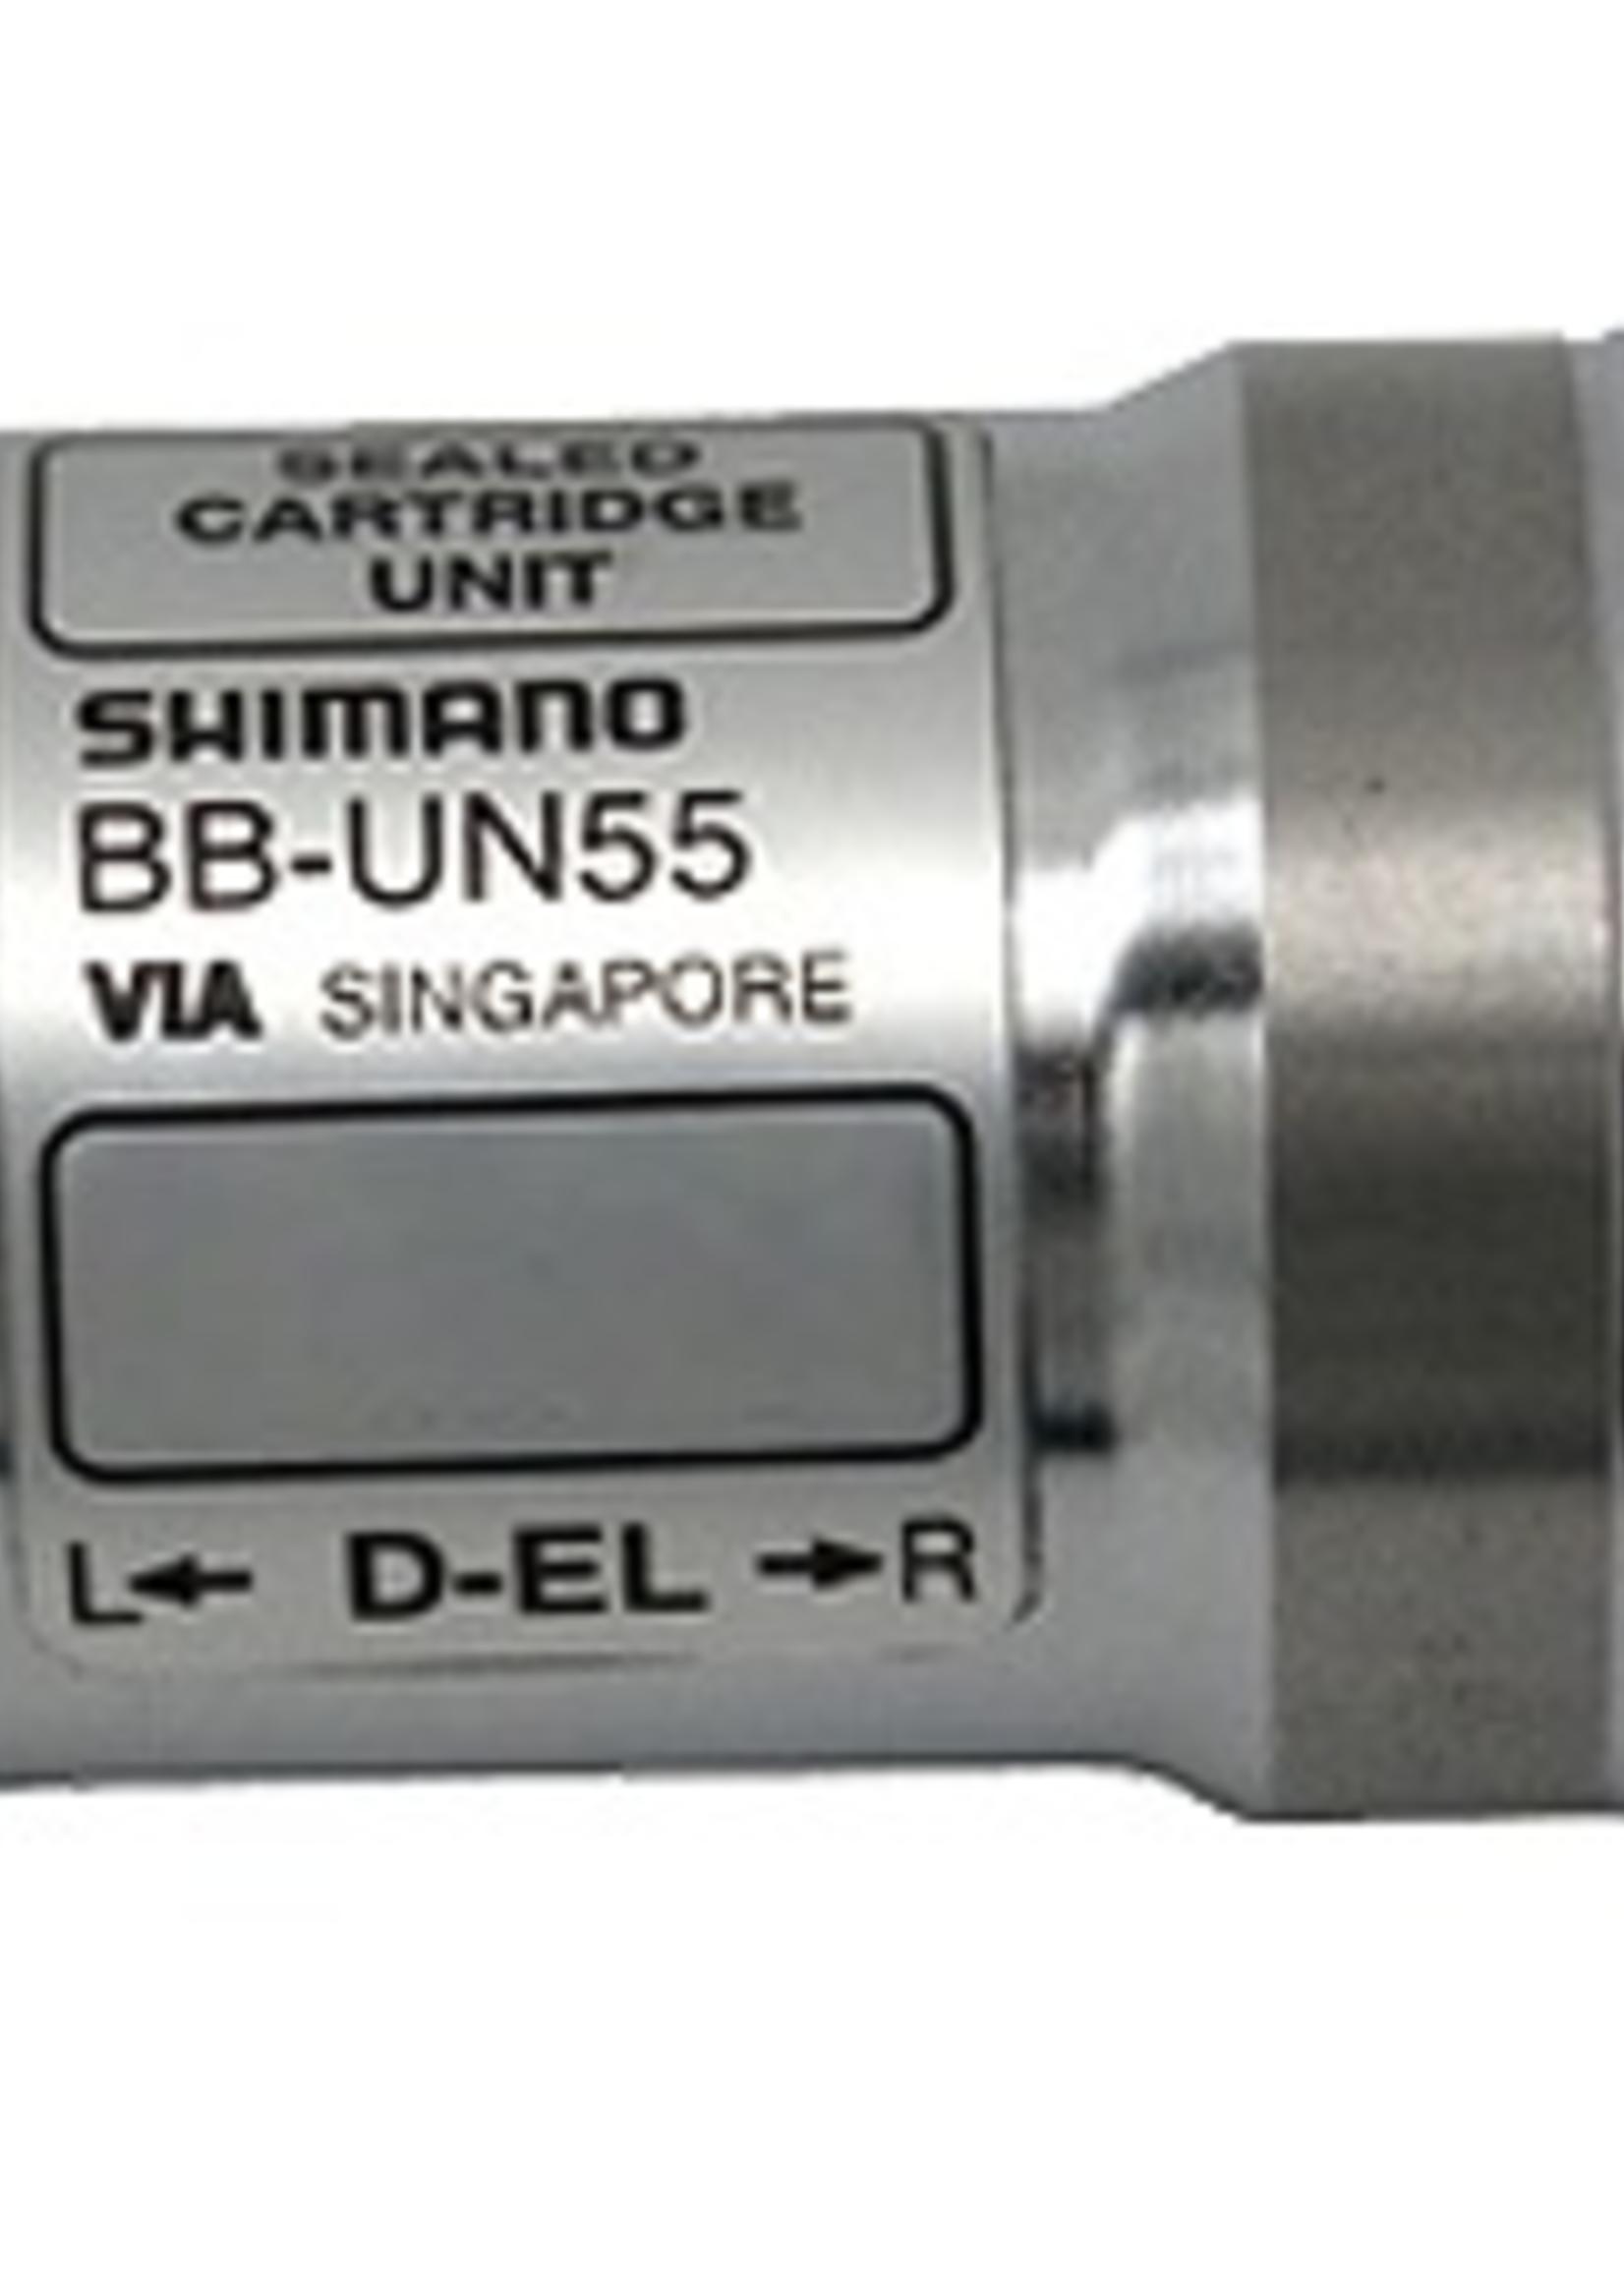 shimano bbun55, square bottom bracket,bsa,68mm, 110mm,steel